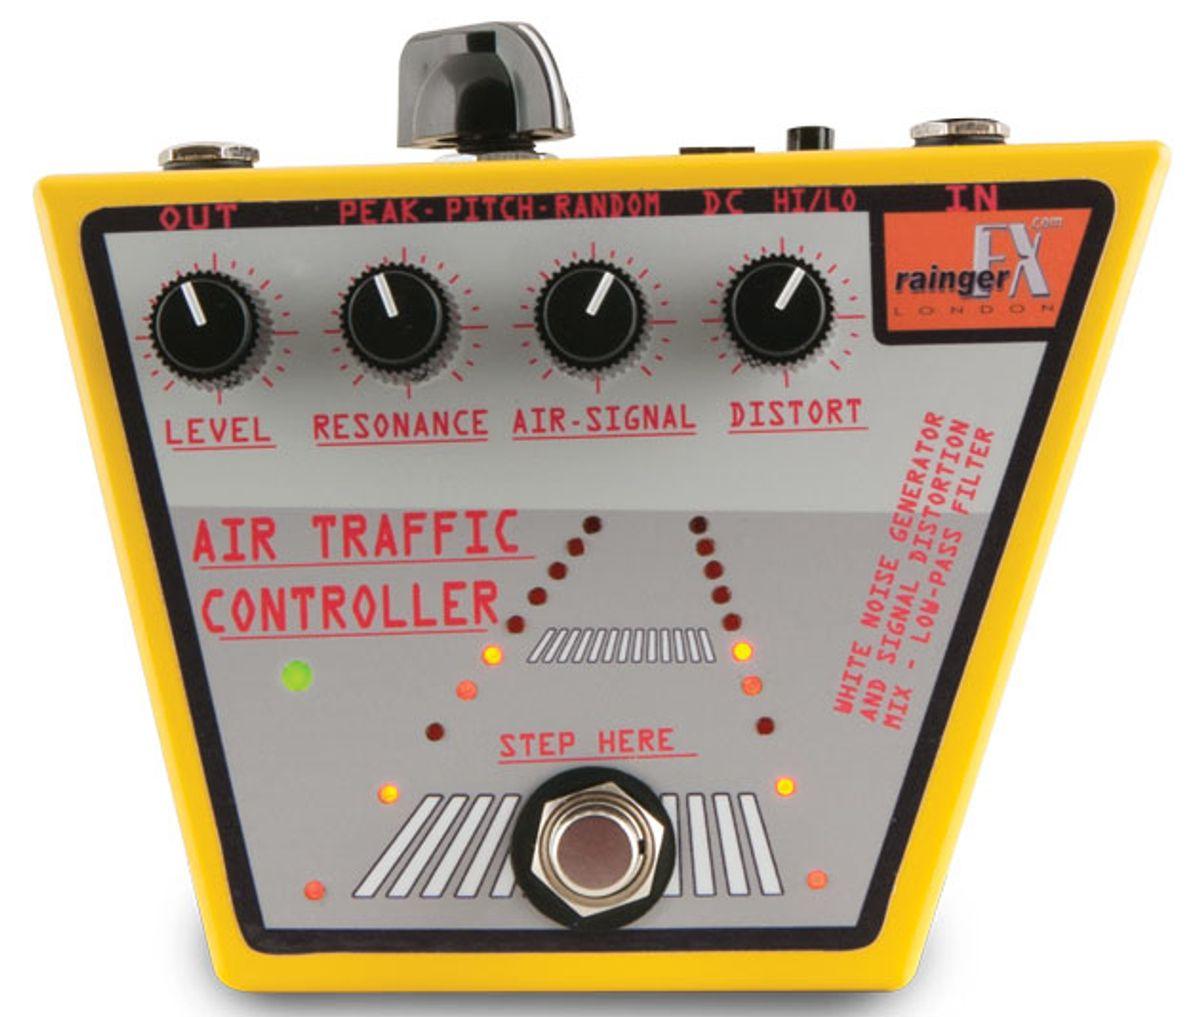 Rainger FX Air Traffic Controller Review